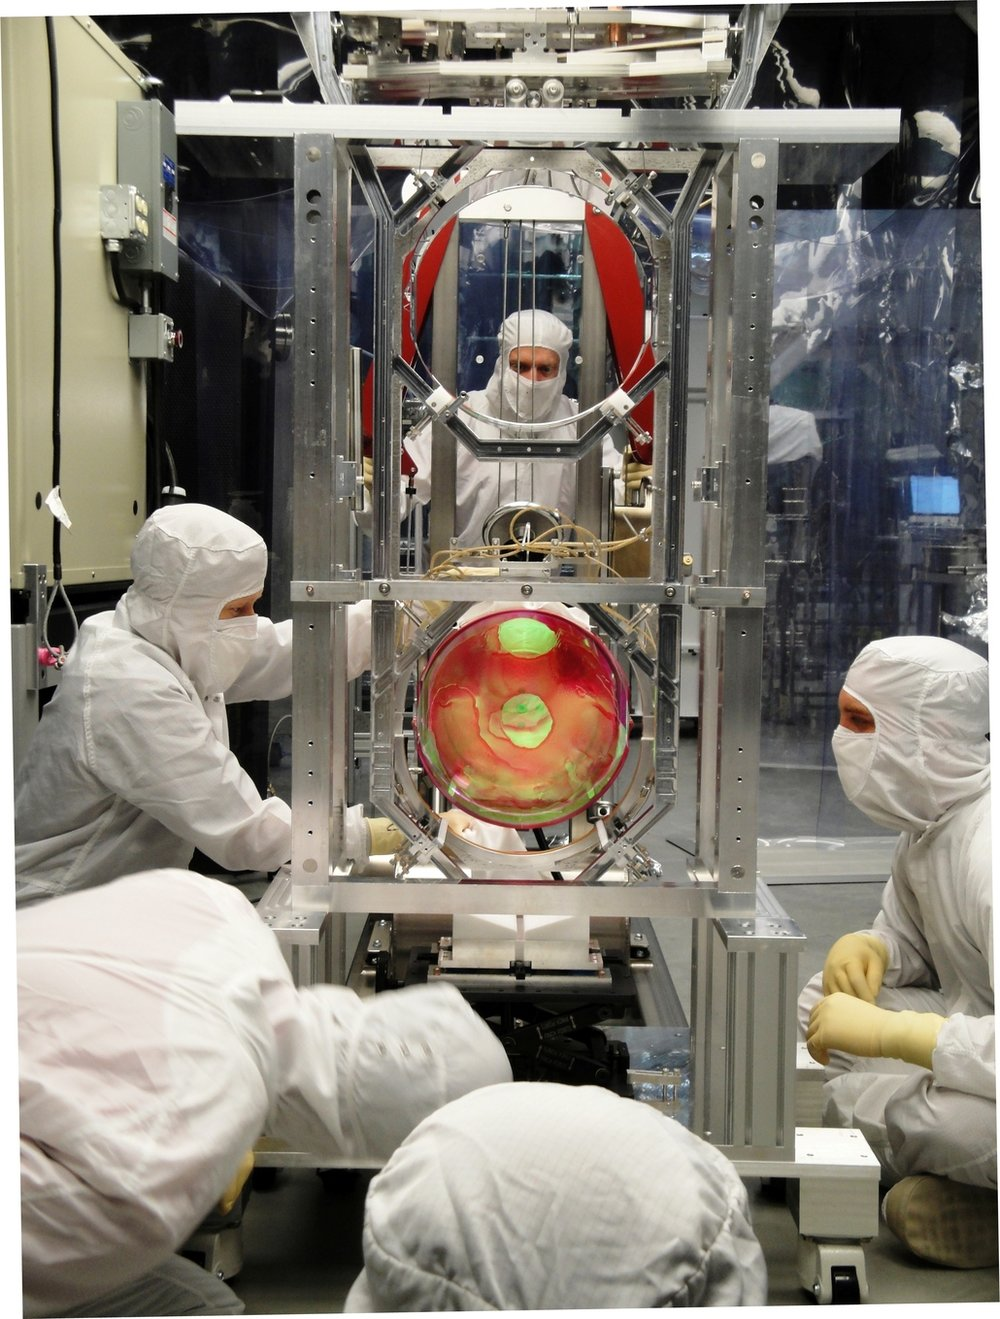 LIGO scientists working on its optics suspension. - Image Credit: LIGO Laboratory, CC BY-ND